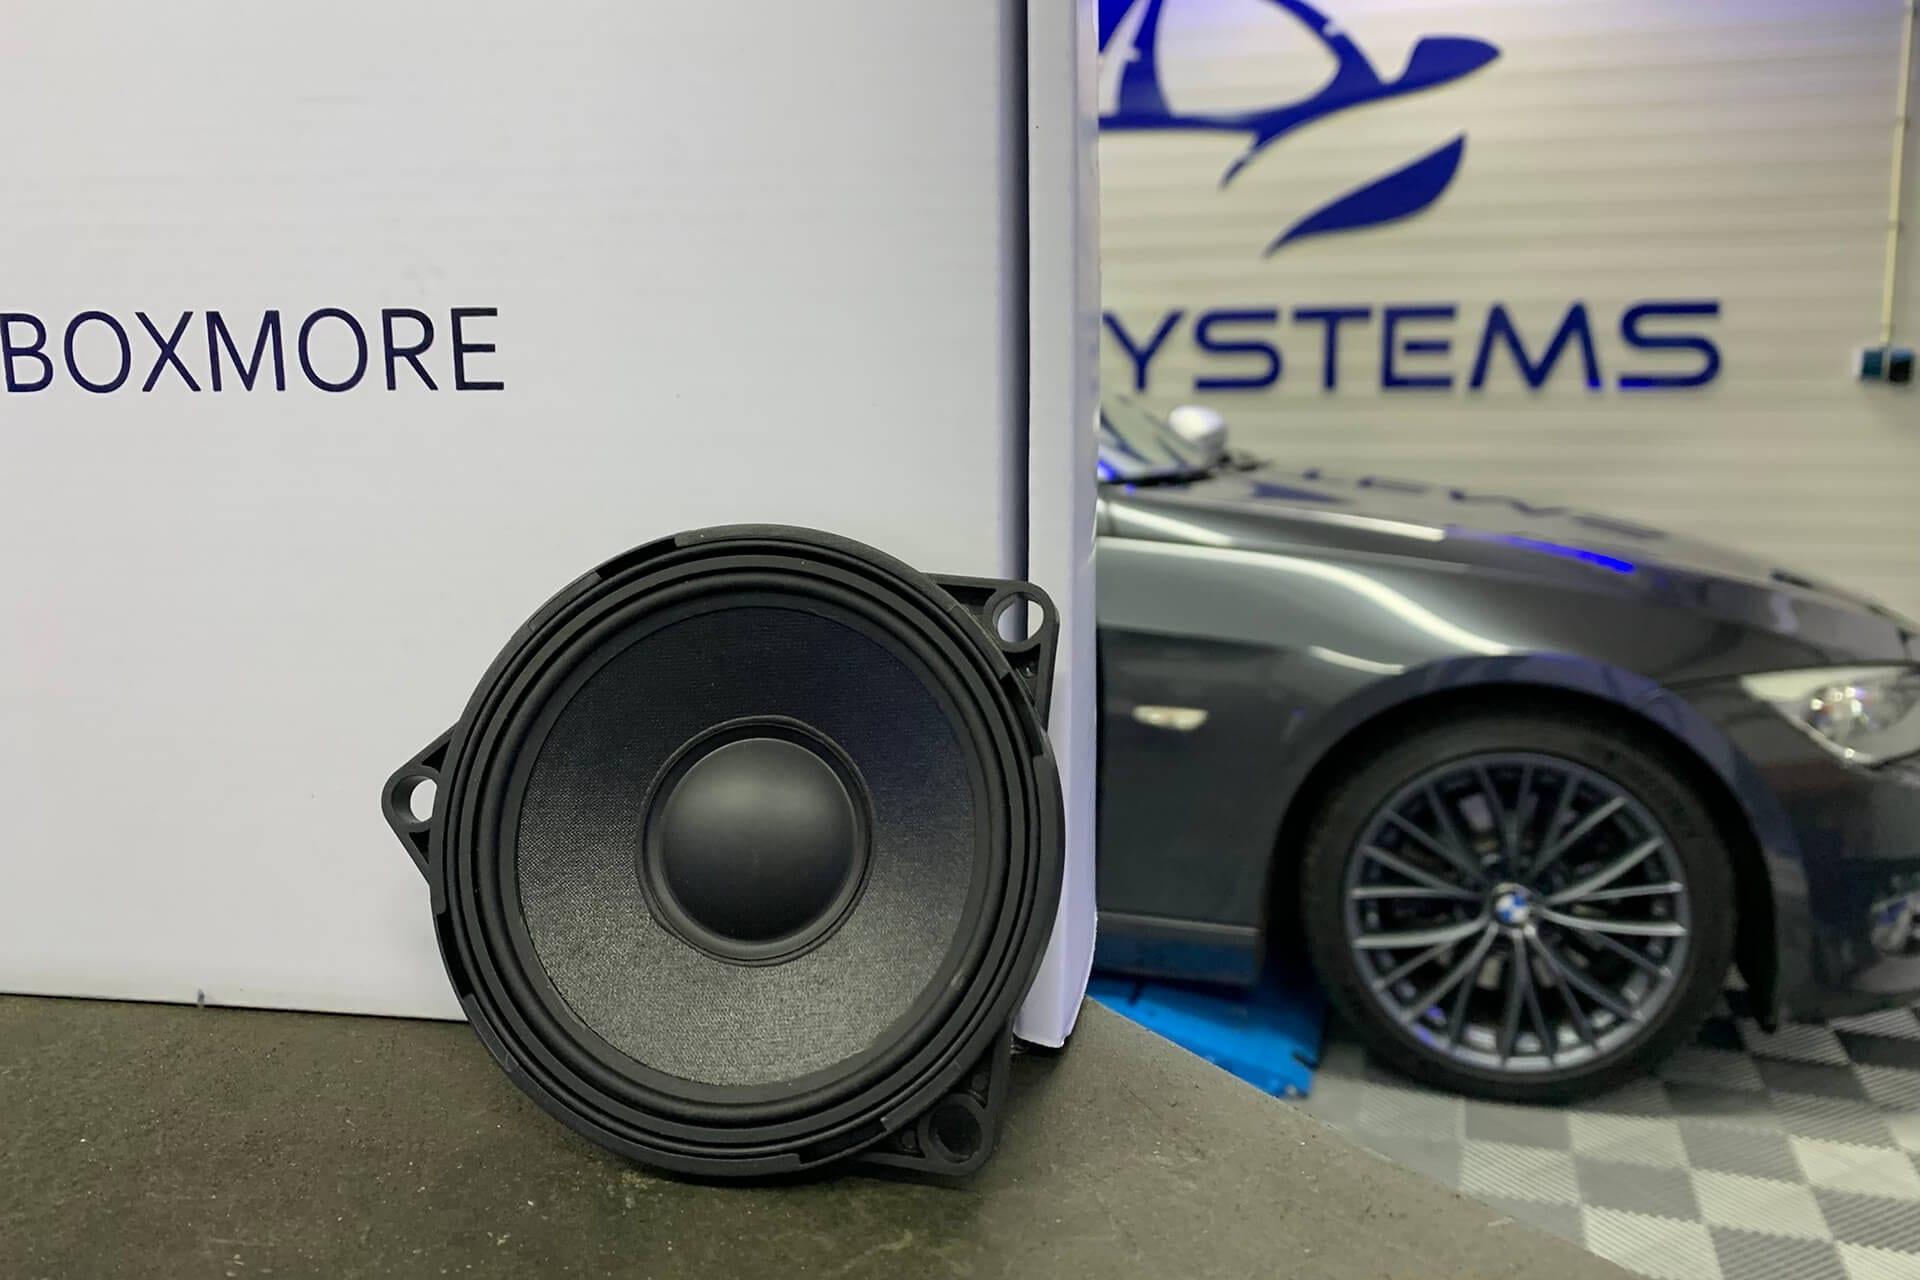 Boxmore speaker